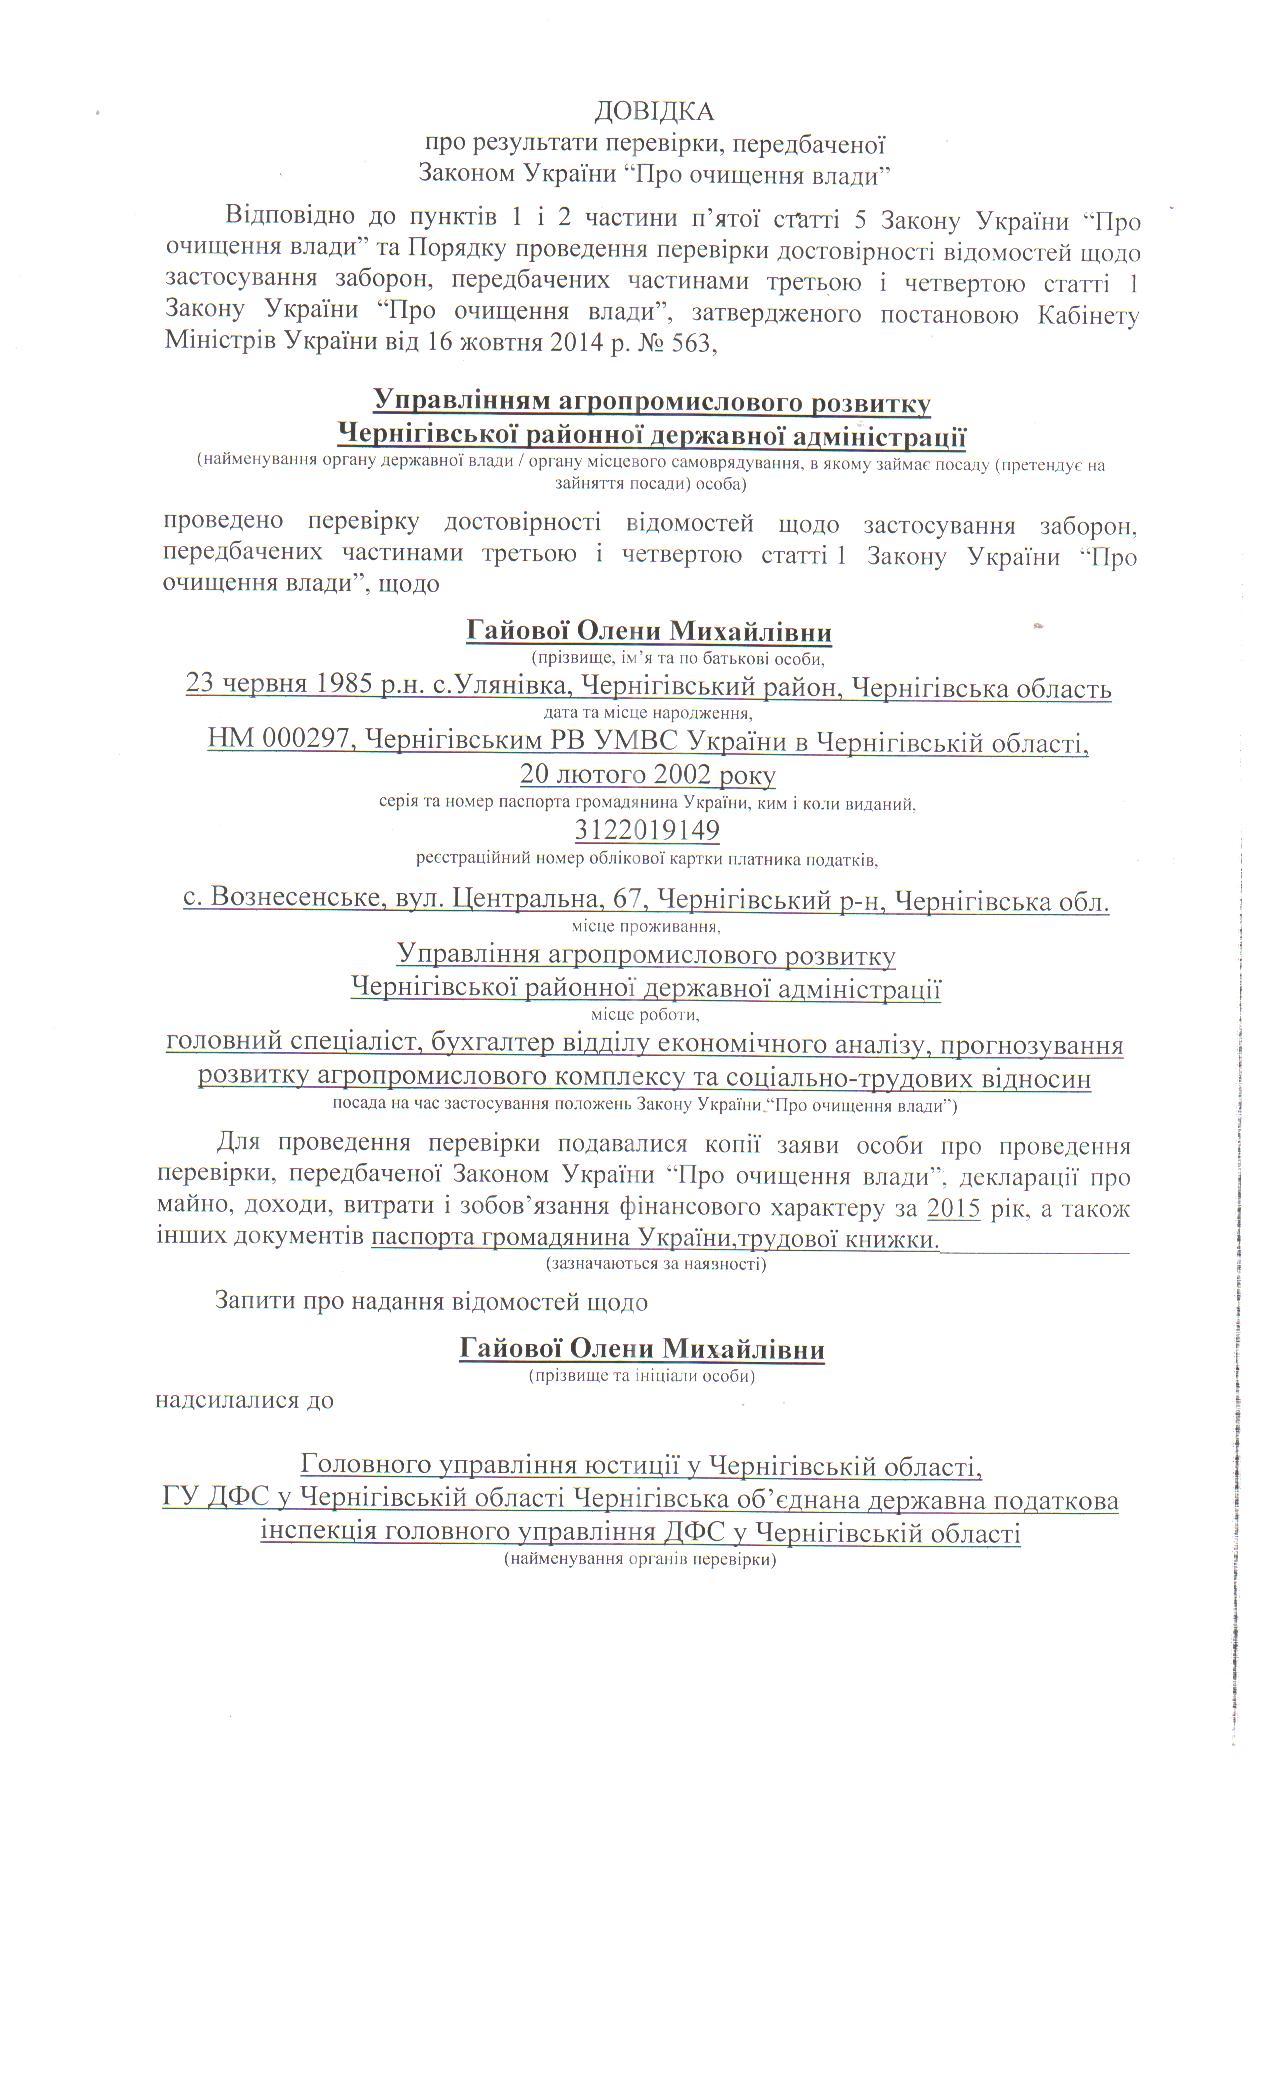 бланк звіту фсс твп ф-4 2014